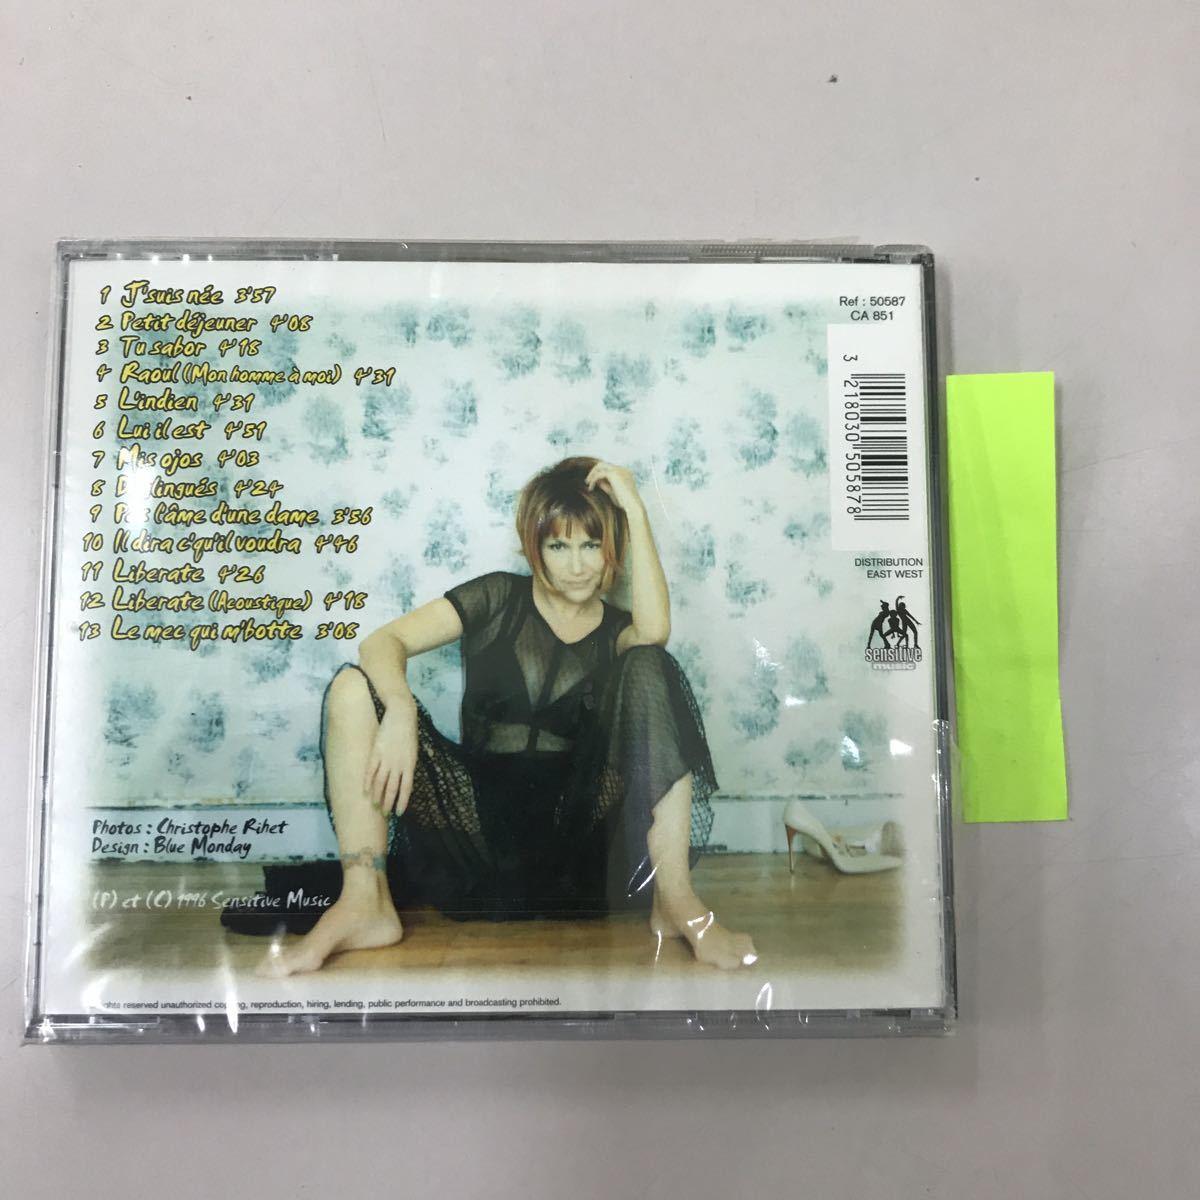 CD 輸入盤未開封【洋楽】長期保存品 cle'mentine ce'larie'